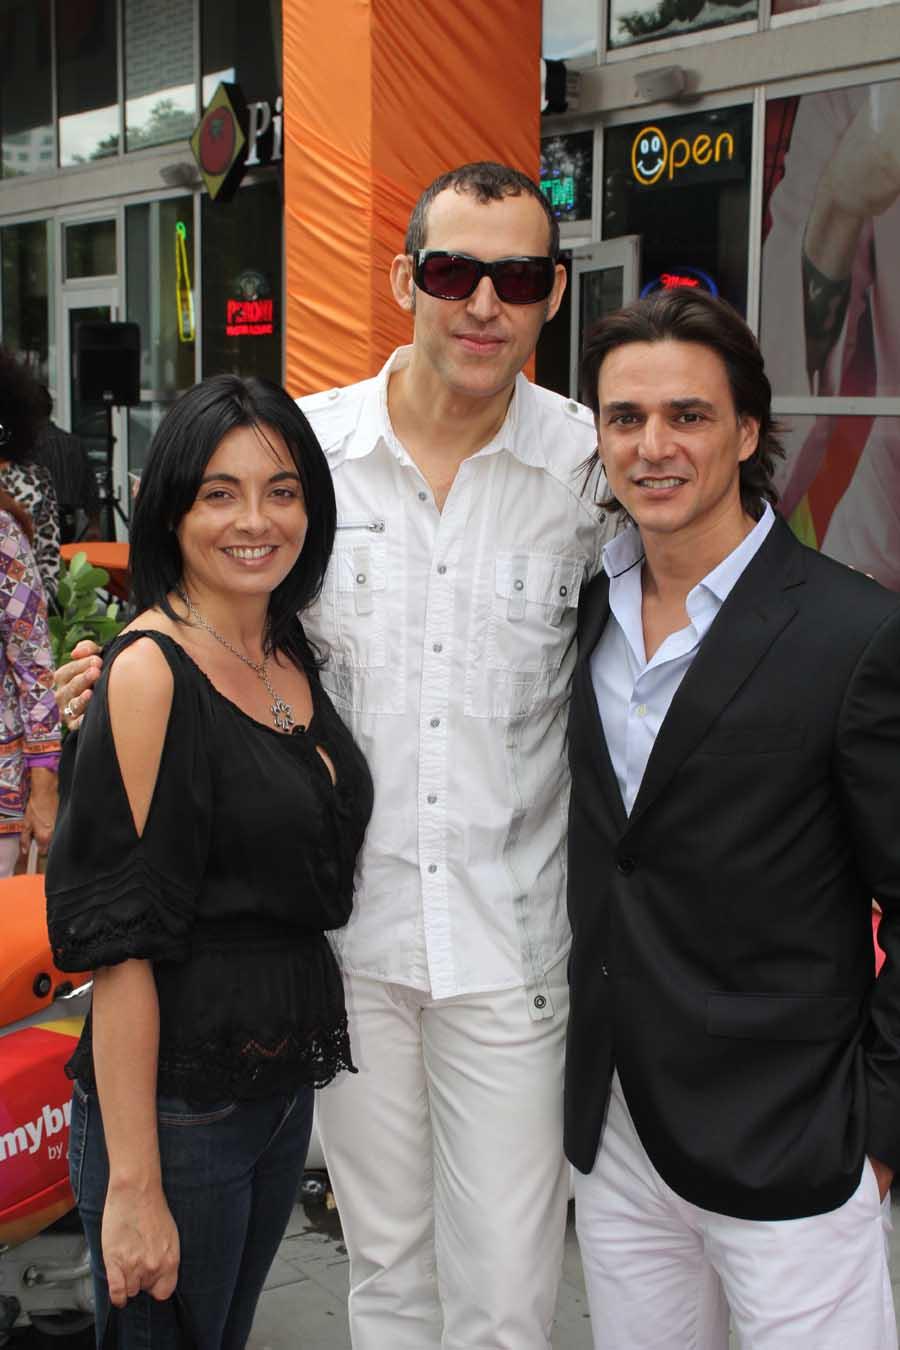 Lera Visconti, Karim Rashid, Paolo Visconti